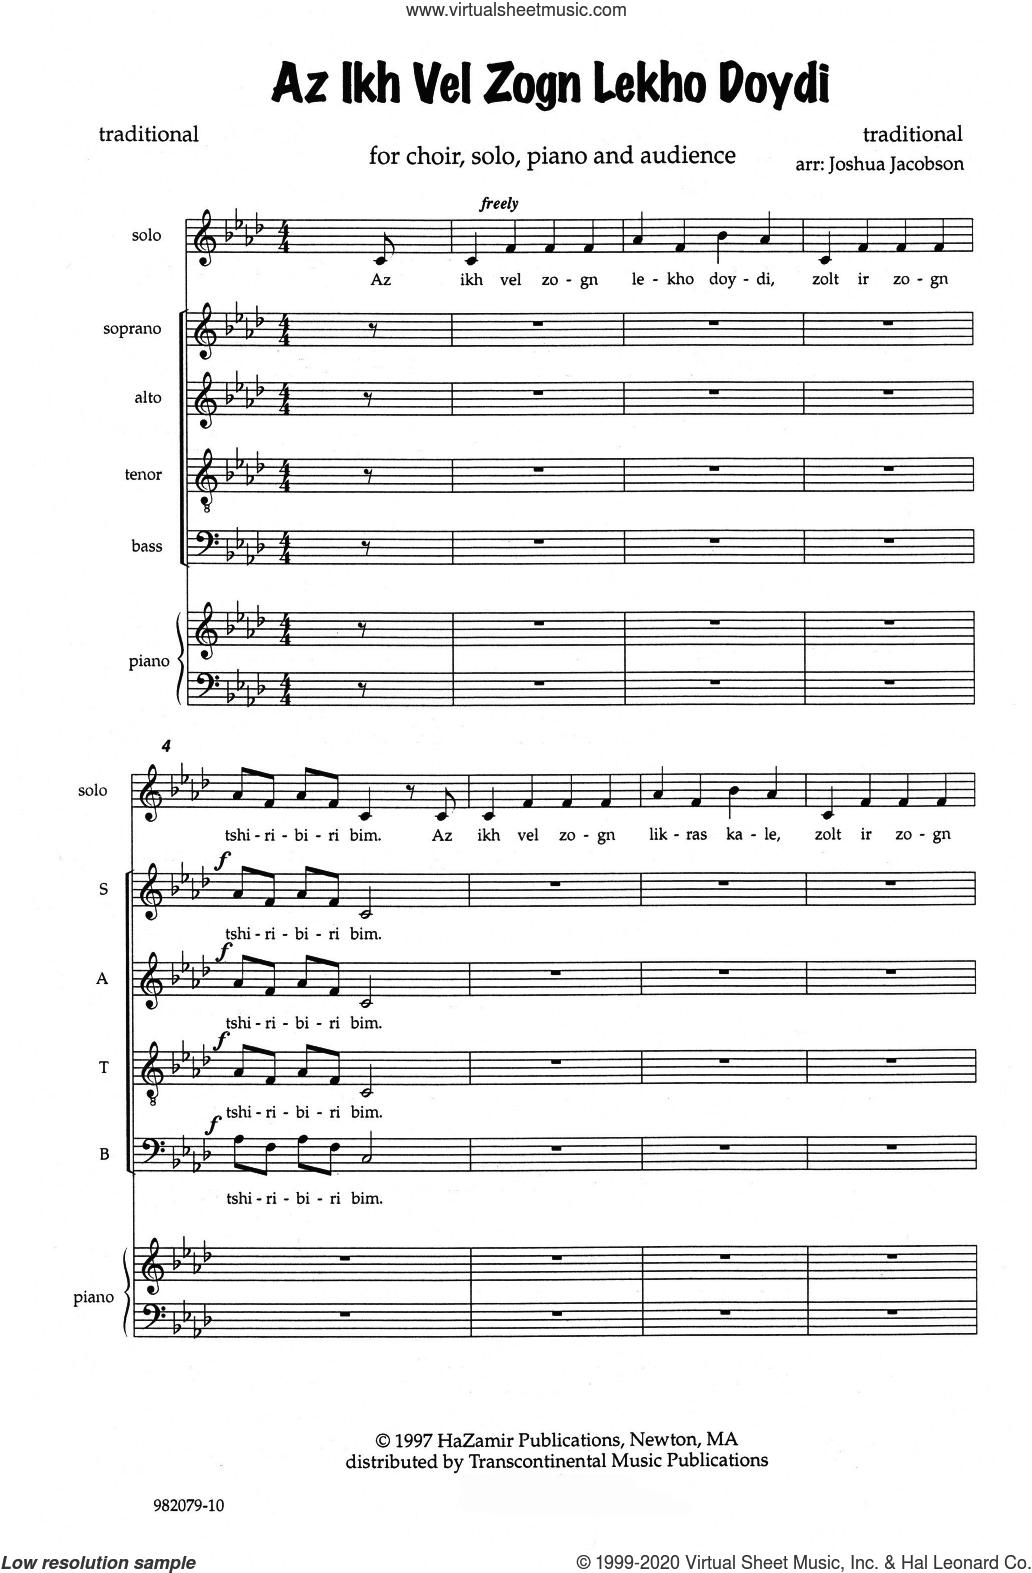 Az Ikh Vel Zogn Lekho Doydi sheet music for choir (SATB: soprano, alto, tenor, bass) by Joshua Jacobson, classical score, intermediate skill level